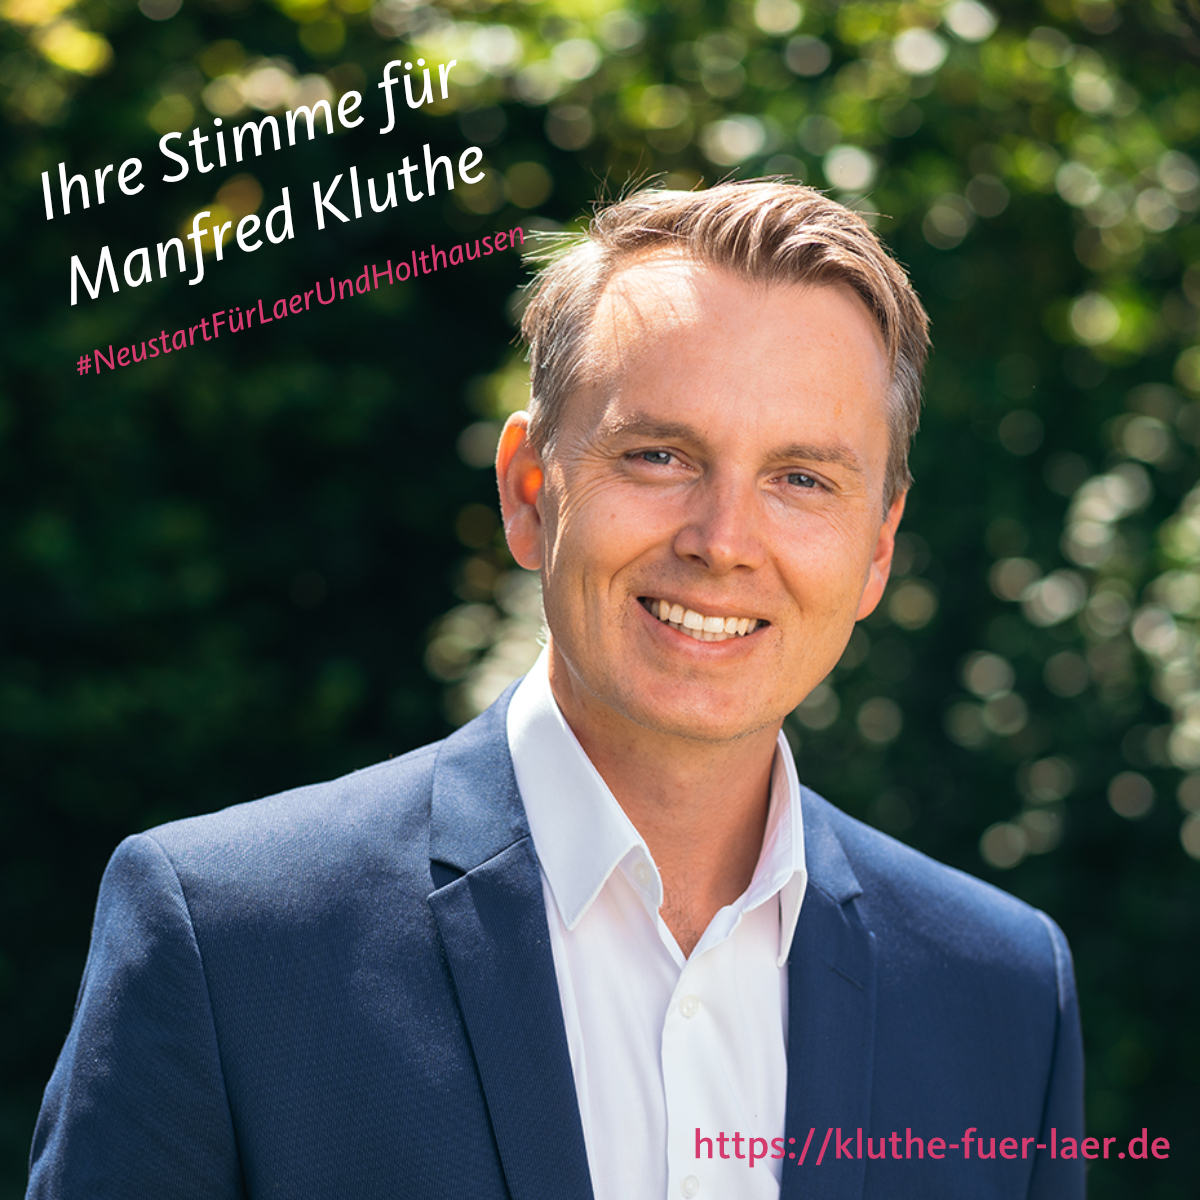 Manfred Kluthe